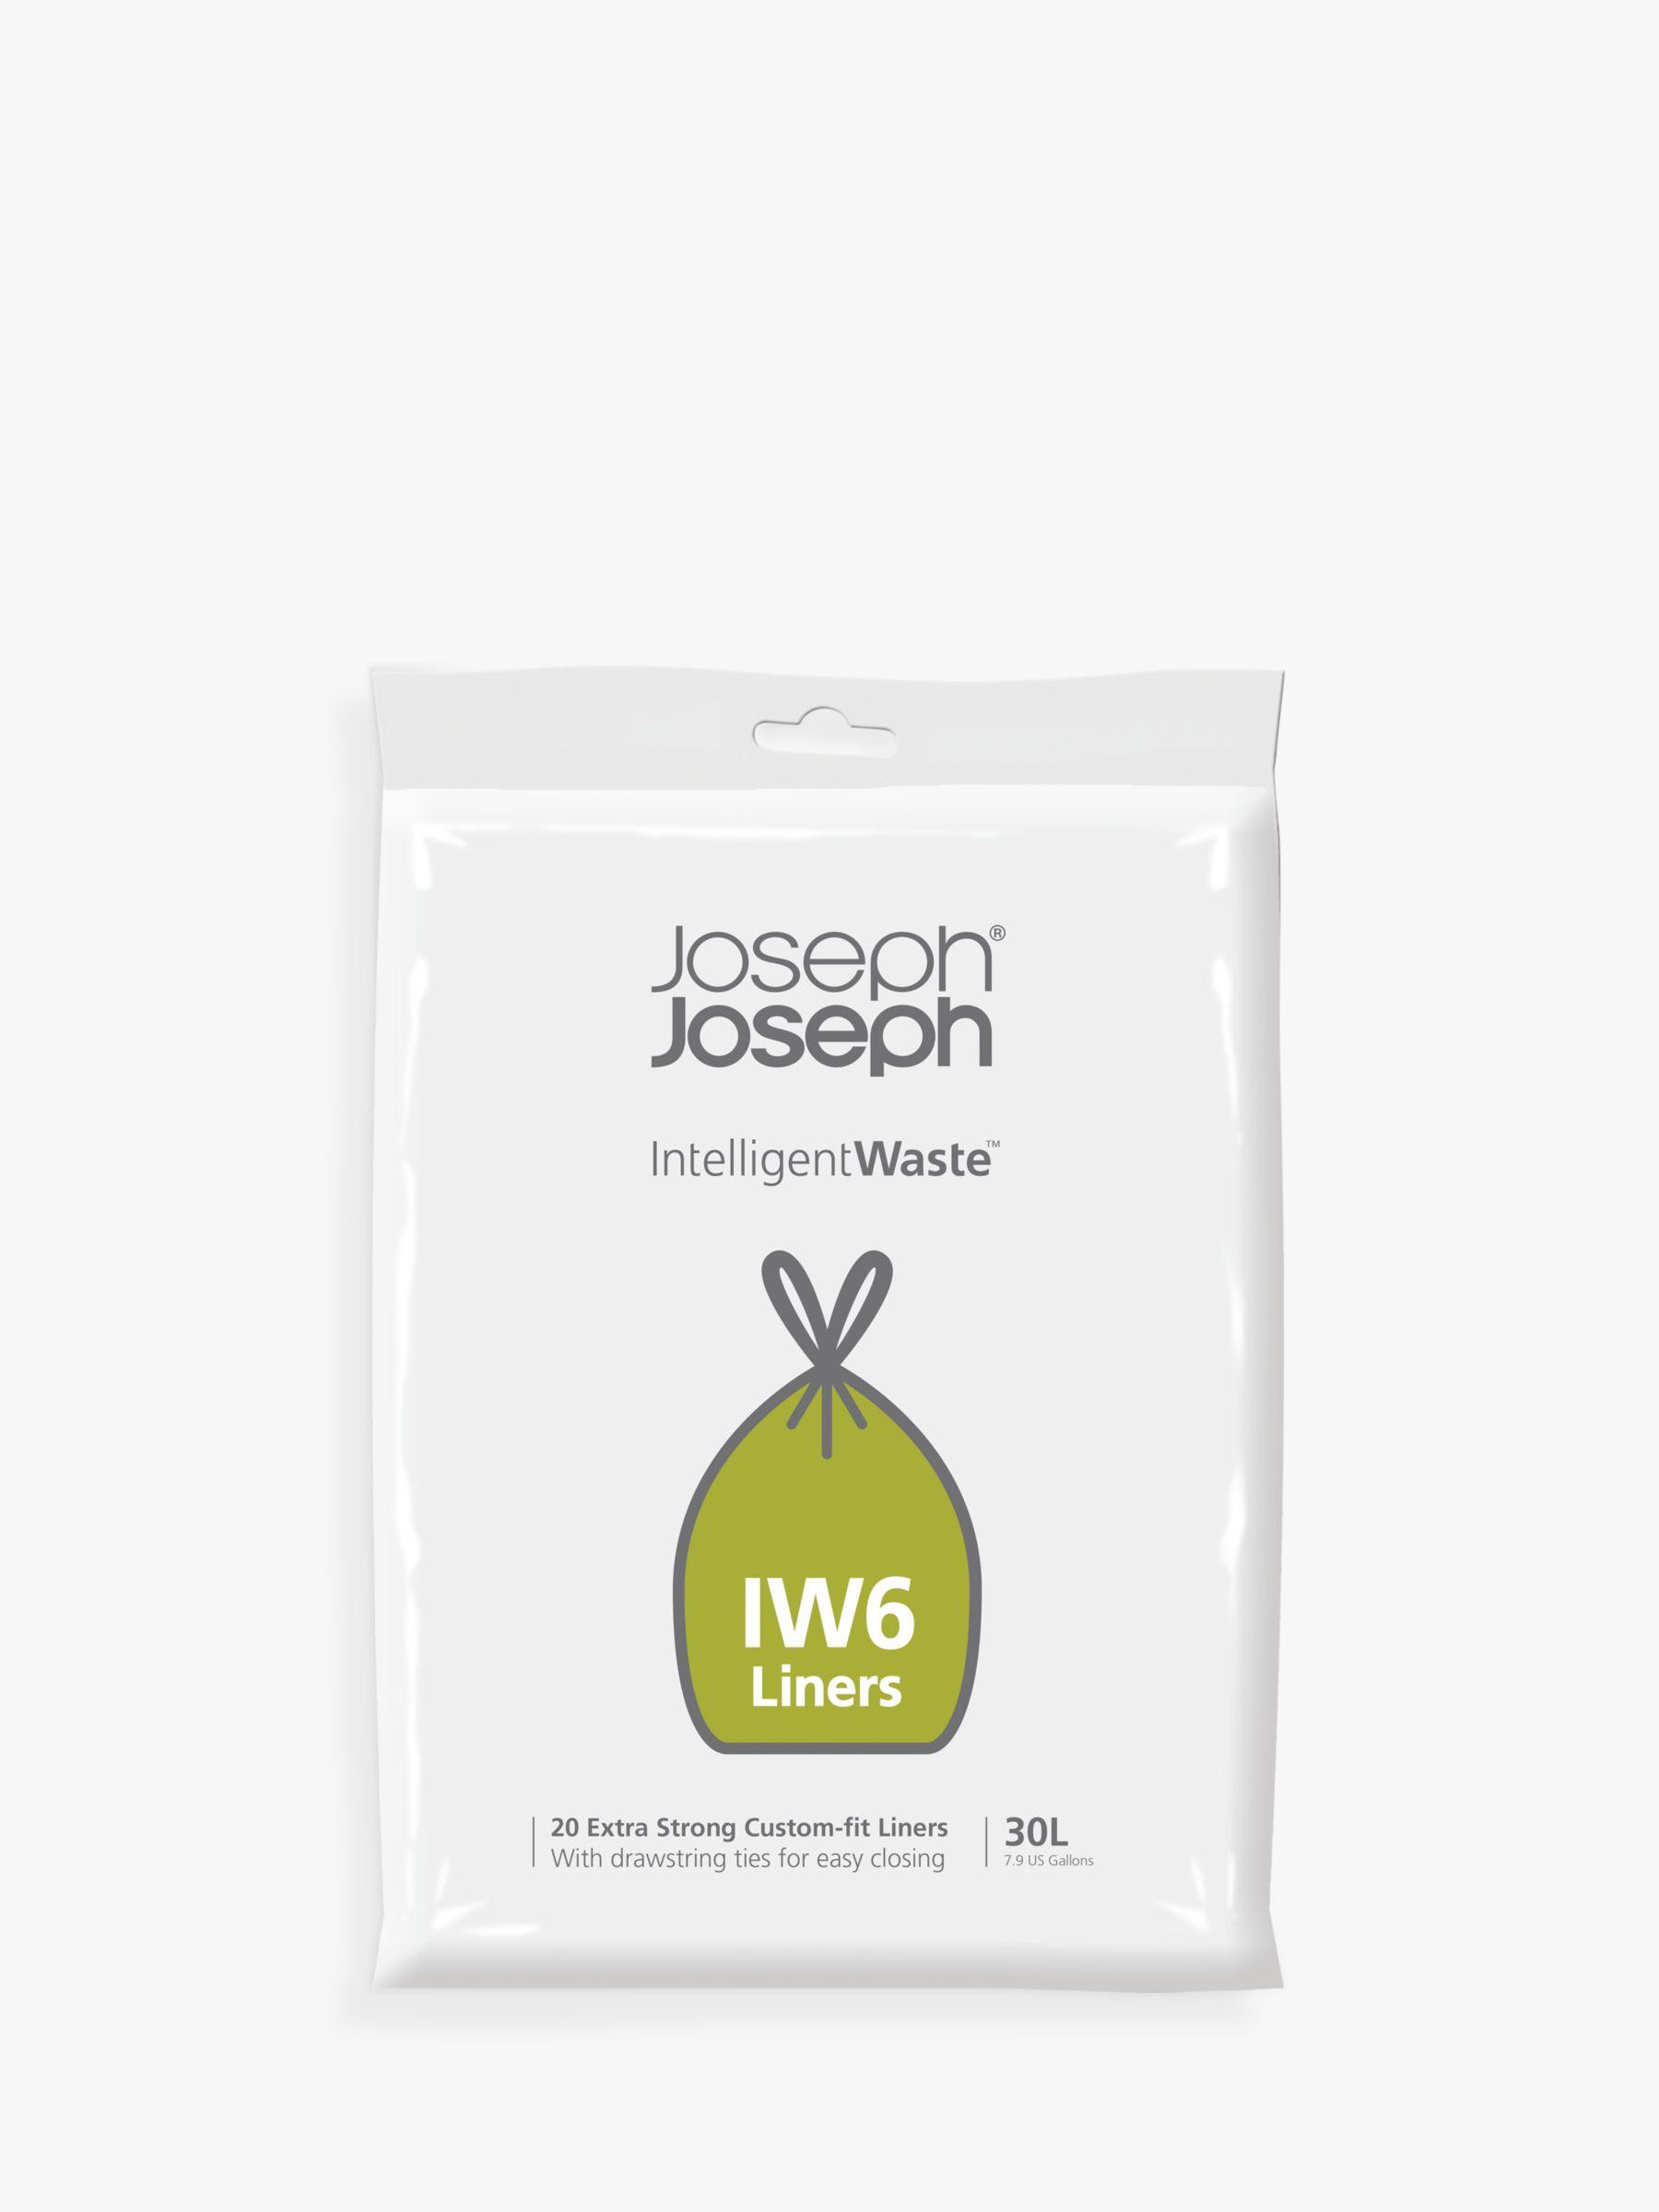 Joseph Joseph IW6 Intelligent Waste General Waste Bin Liners, 30L, Pack of 20